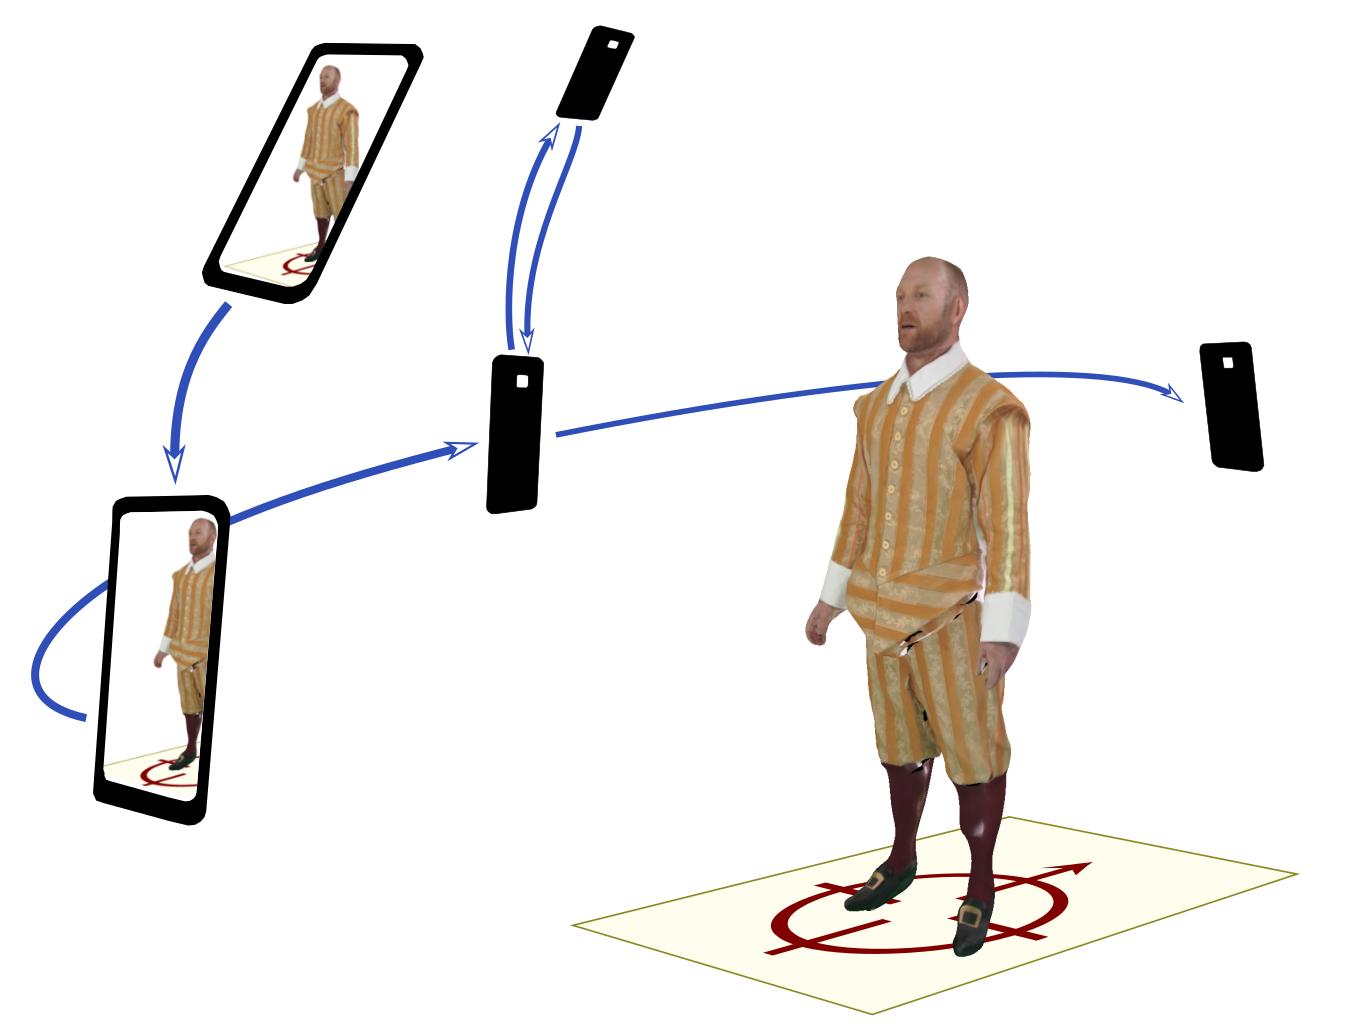 User Behaviour Analysis of Volumetric Video